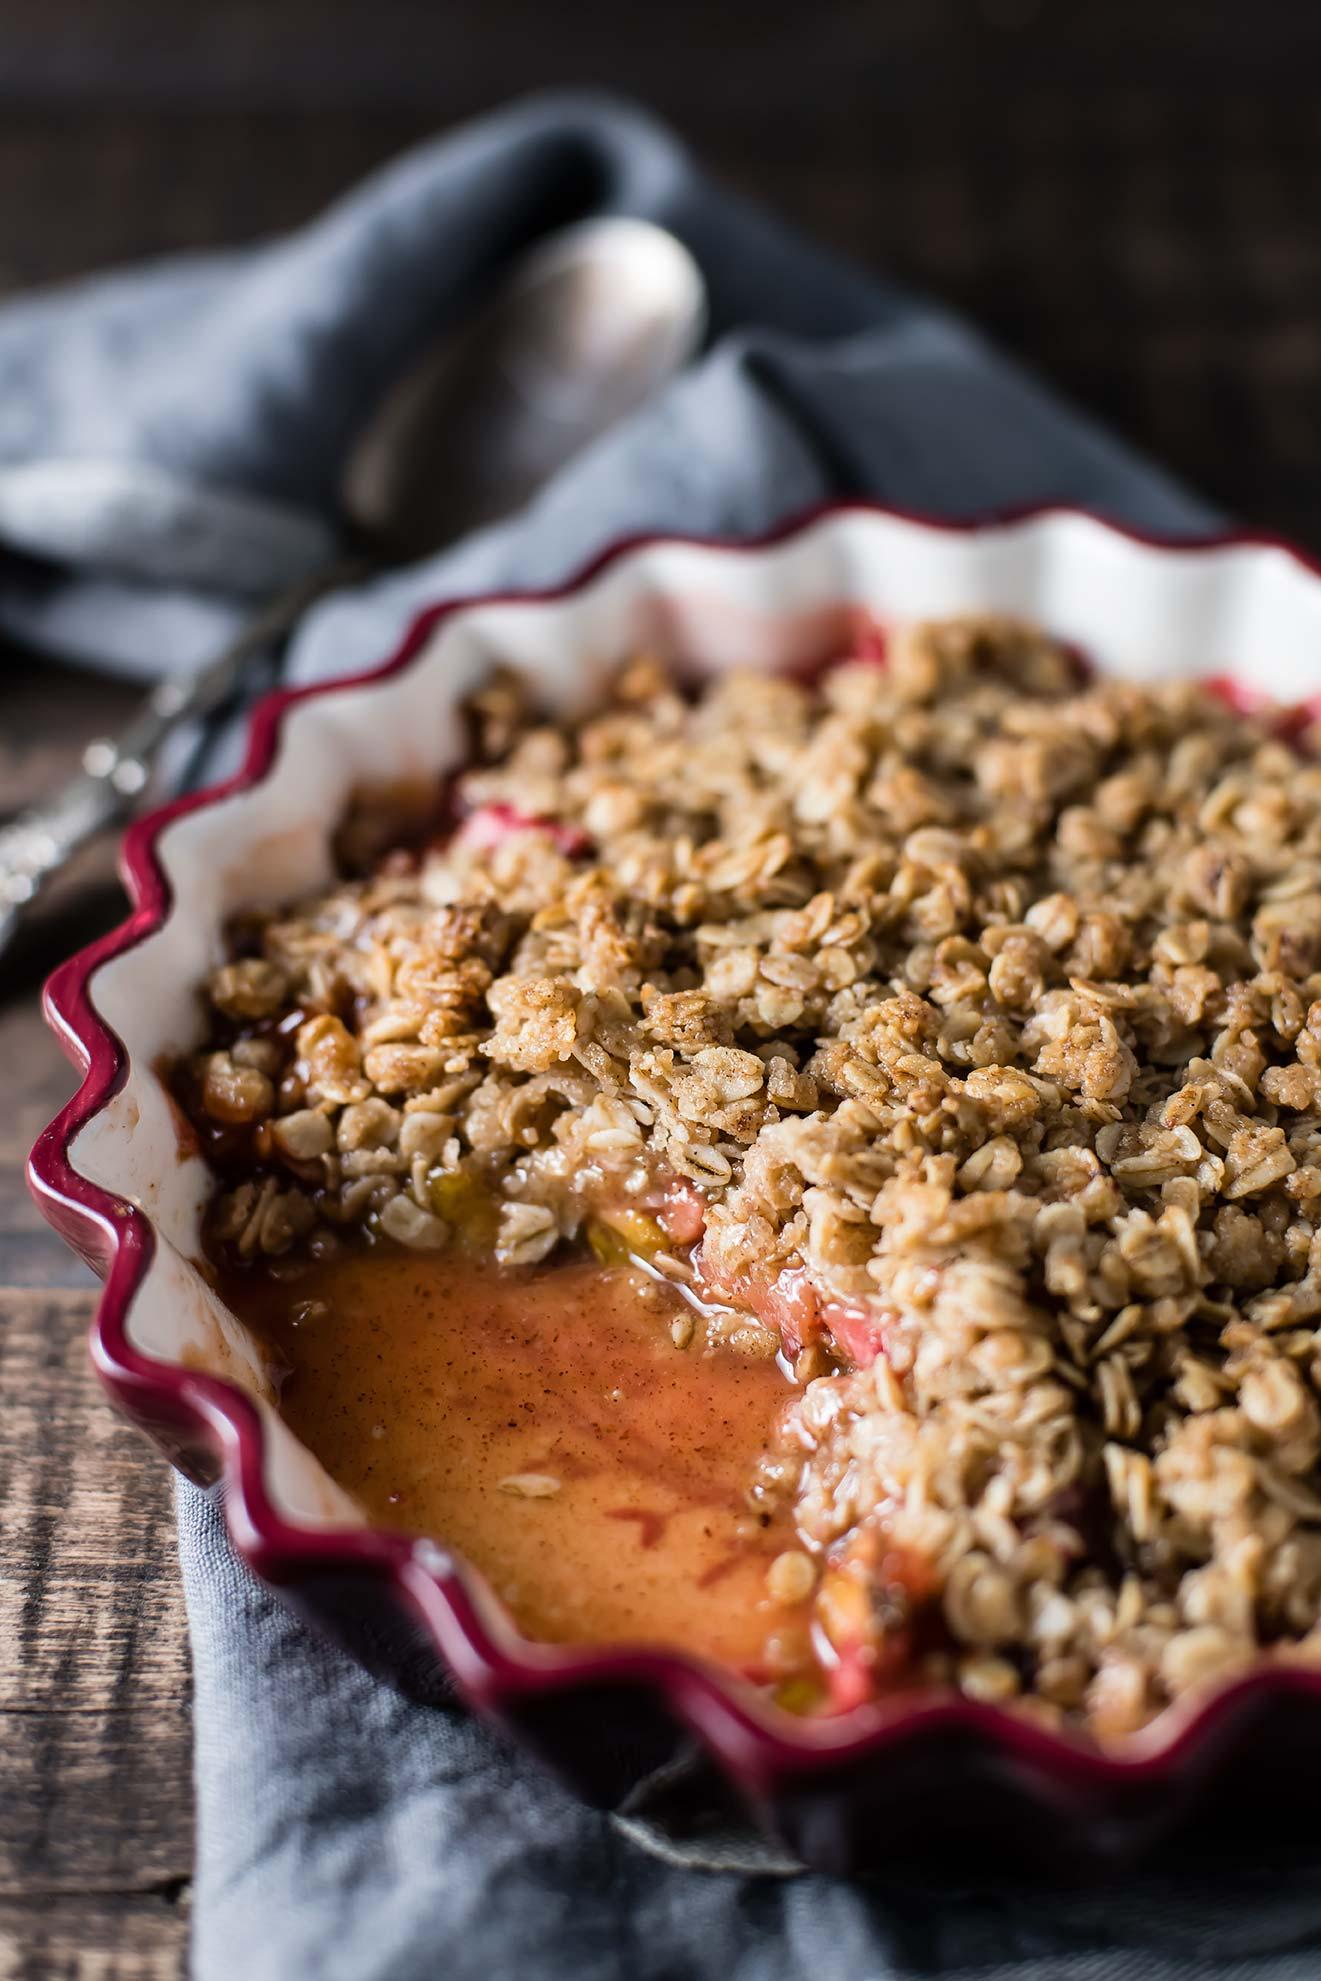 Gluten-Free Rhubarb Crisp